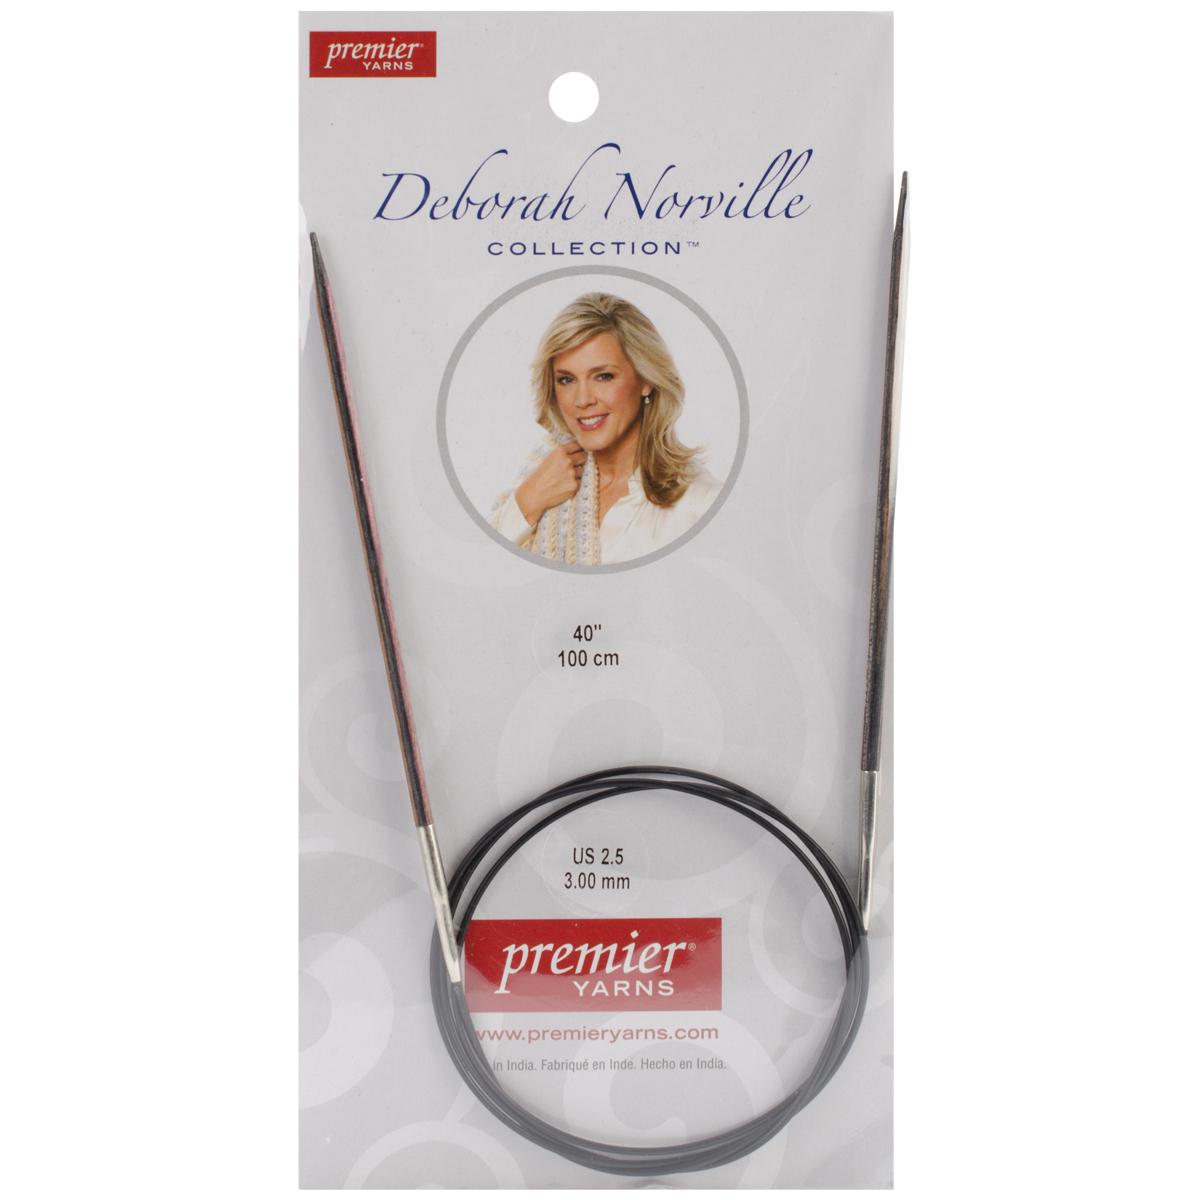 Premier Yarns Deborah Norville Fixed Circular Needles, 40-Inch, 2.5/3.0mm Multi-Colored